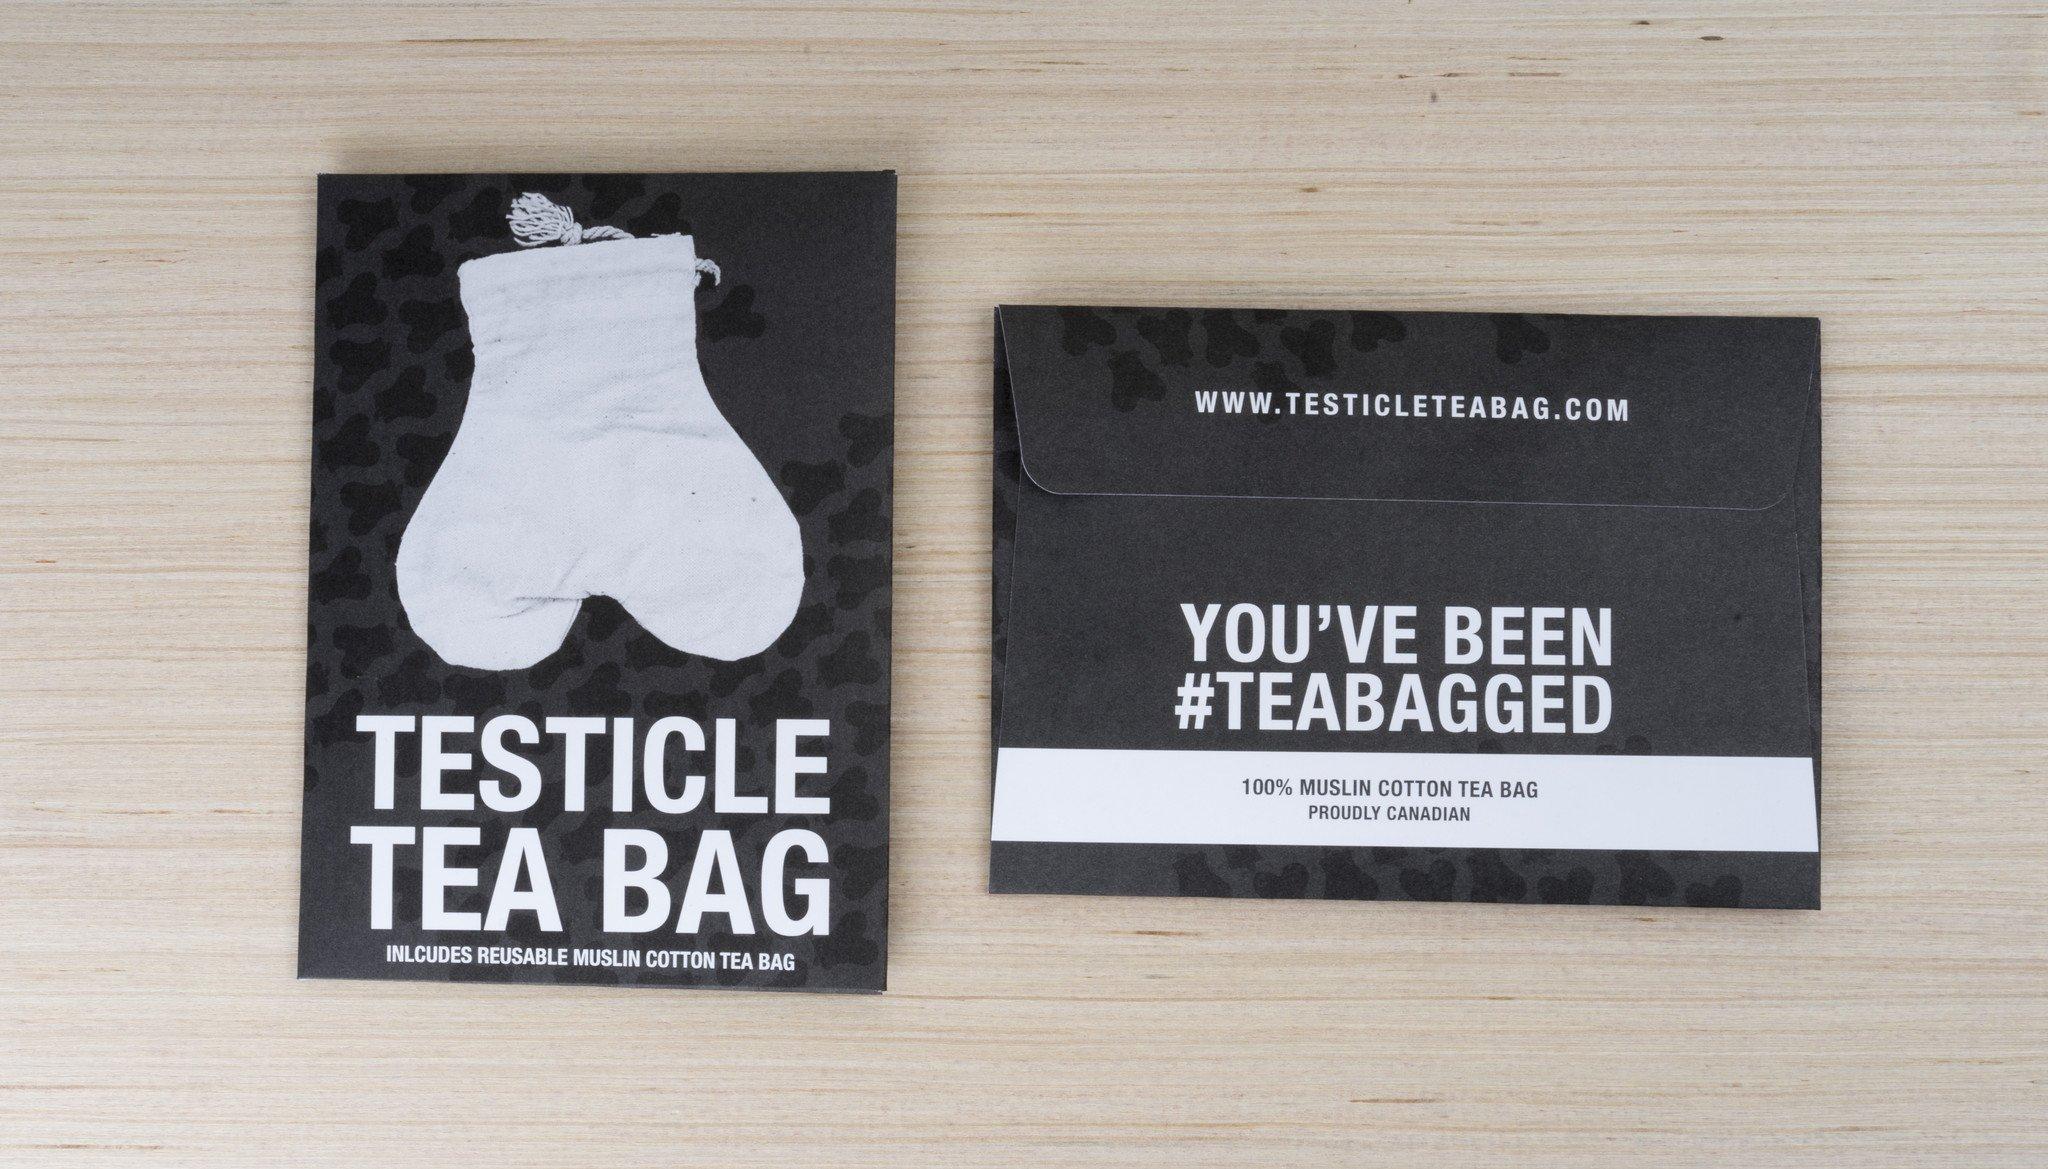 Testicle TeaBag